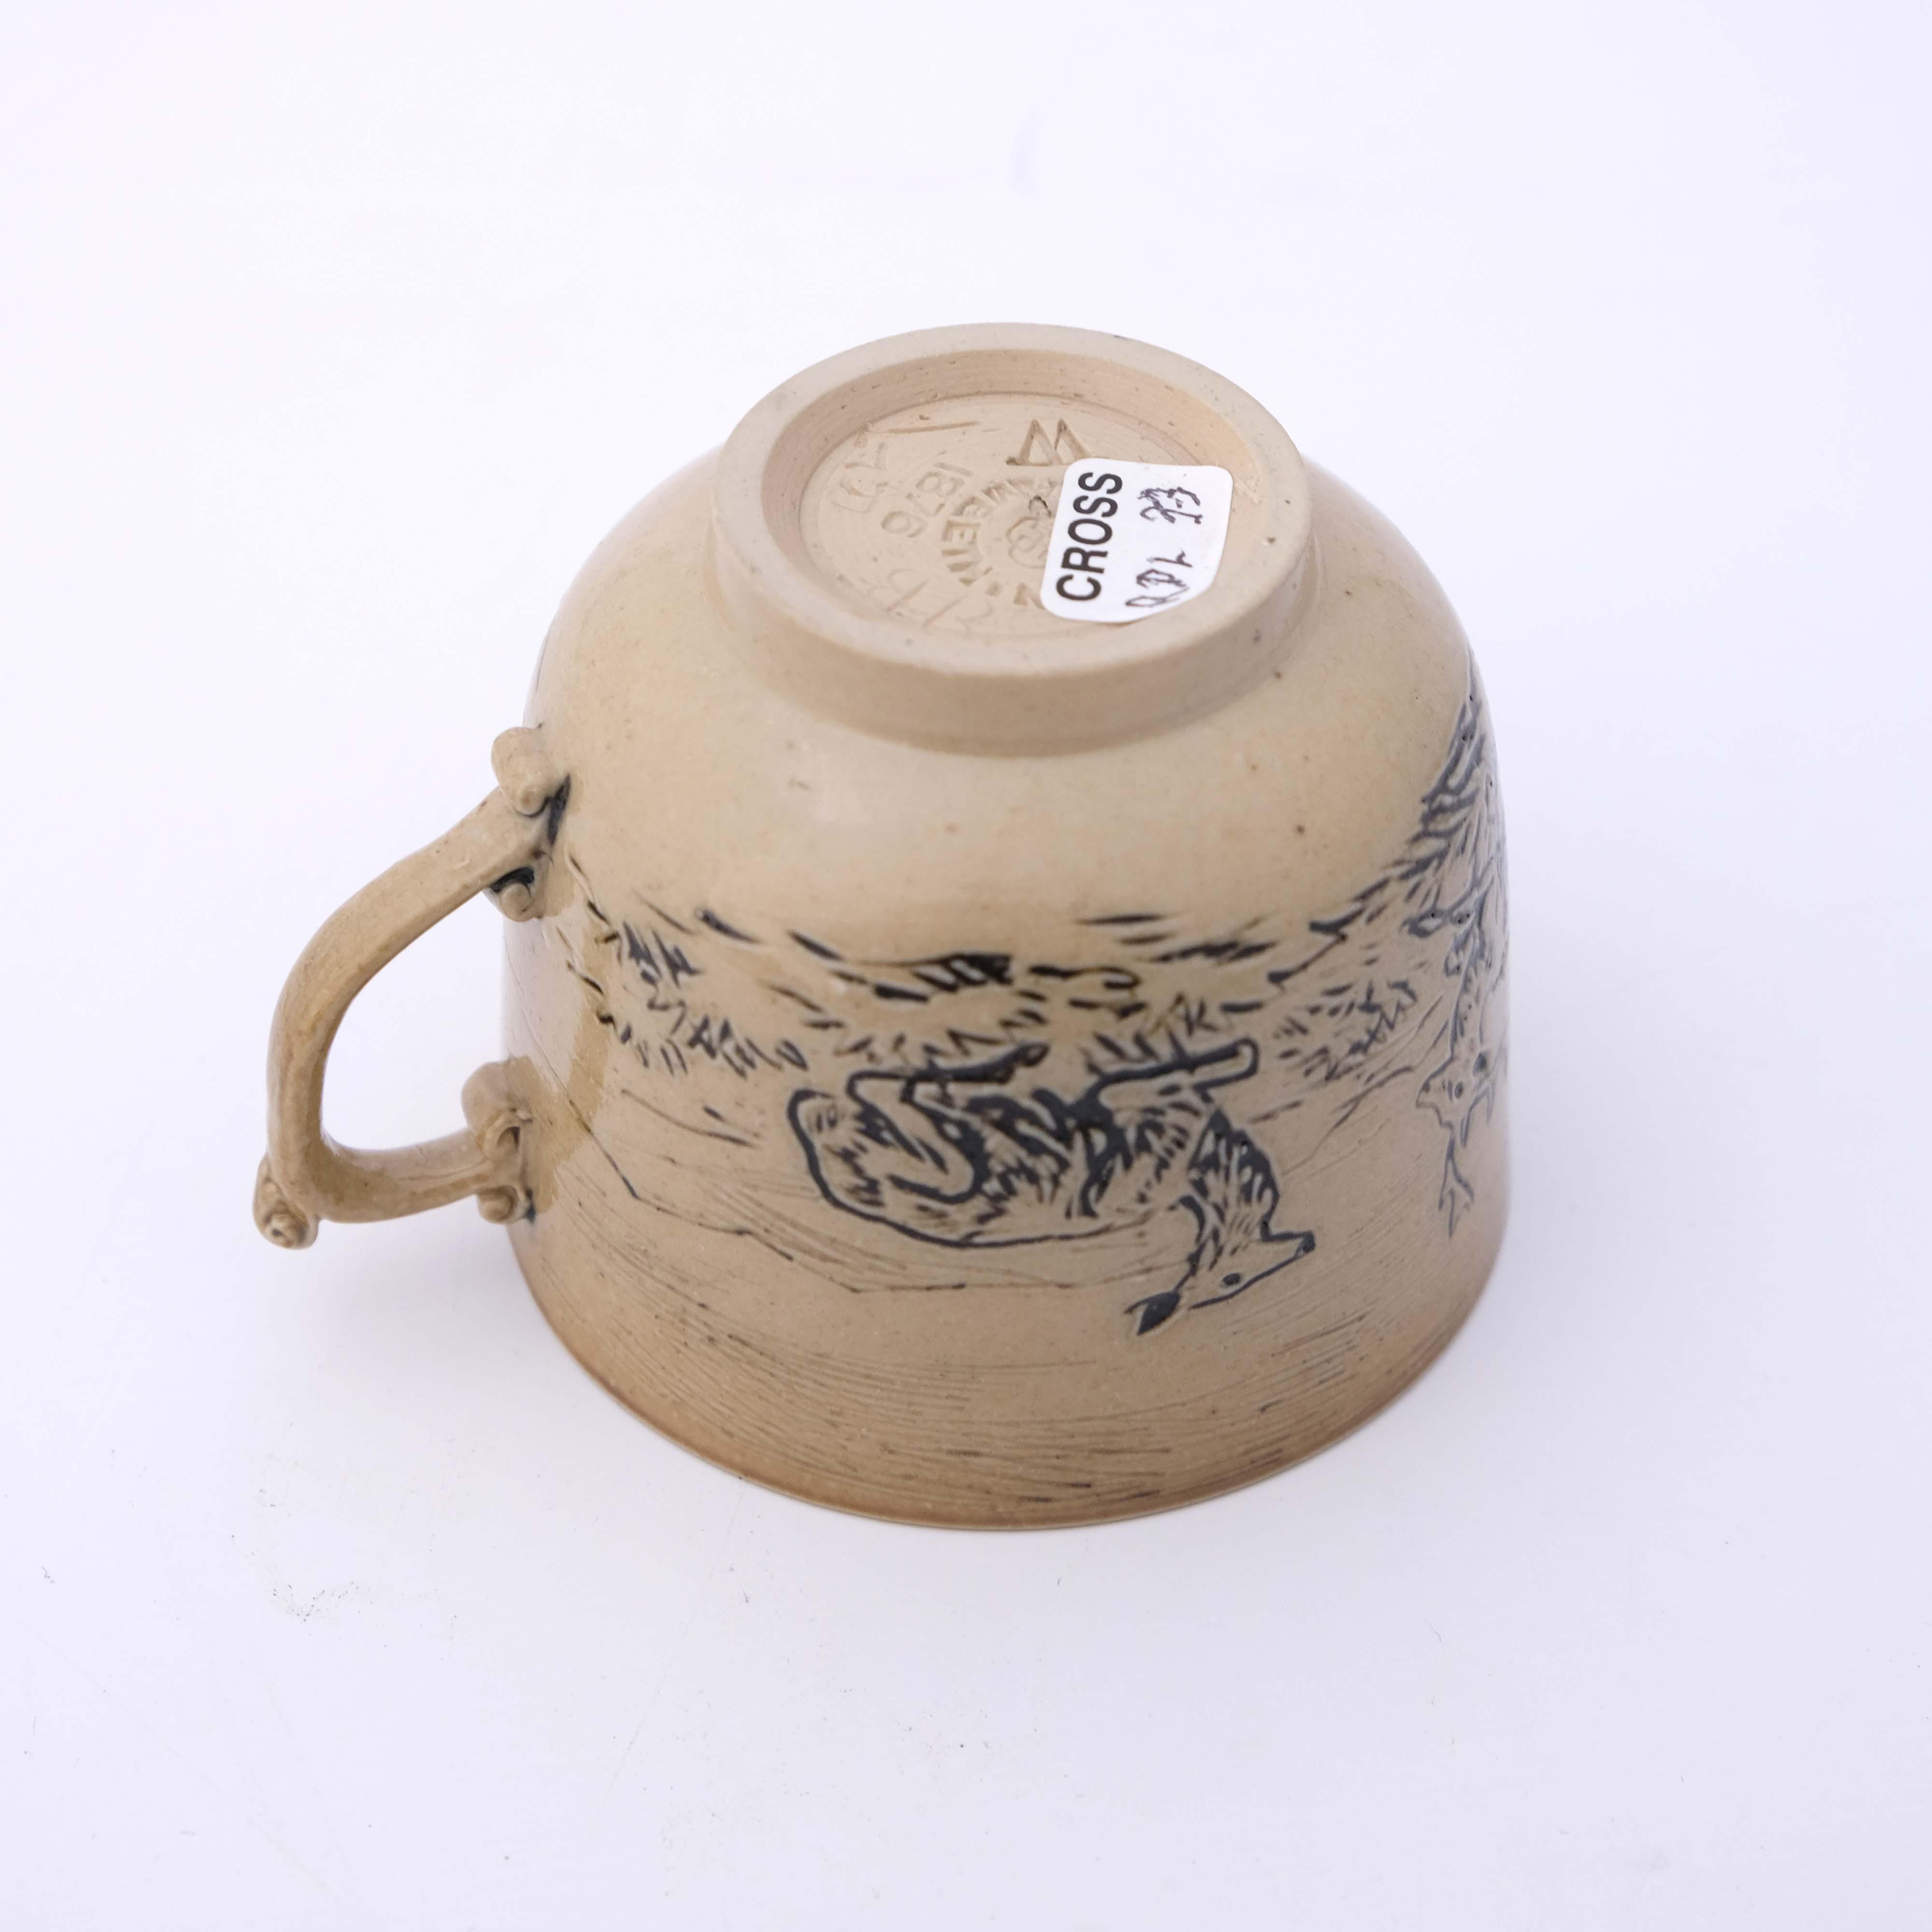 Hannah Barlow for Doulton Lambeth, a stoneware cof - Image 4 of 5